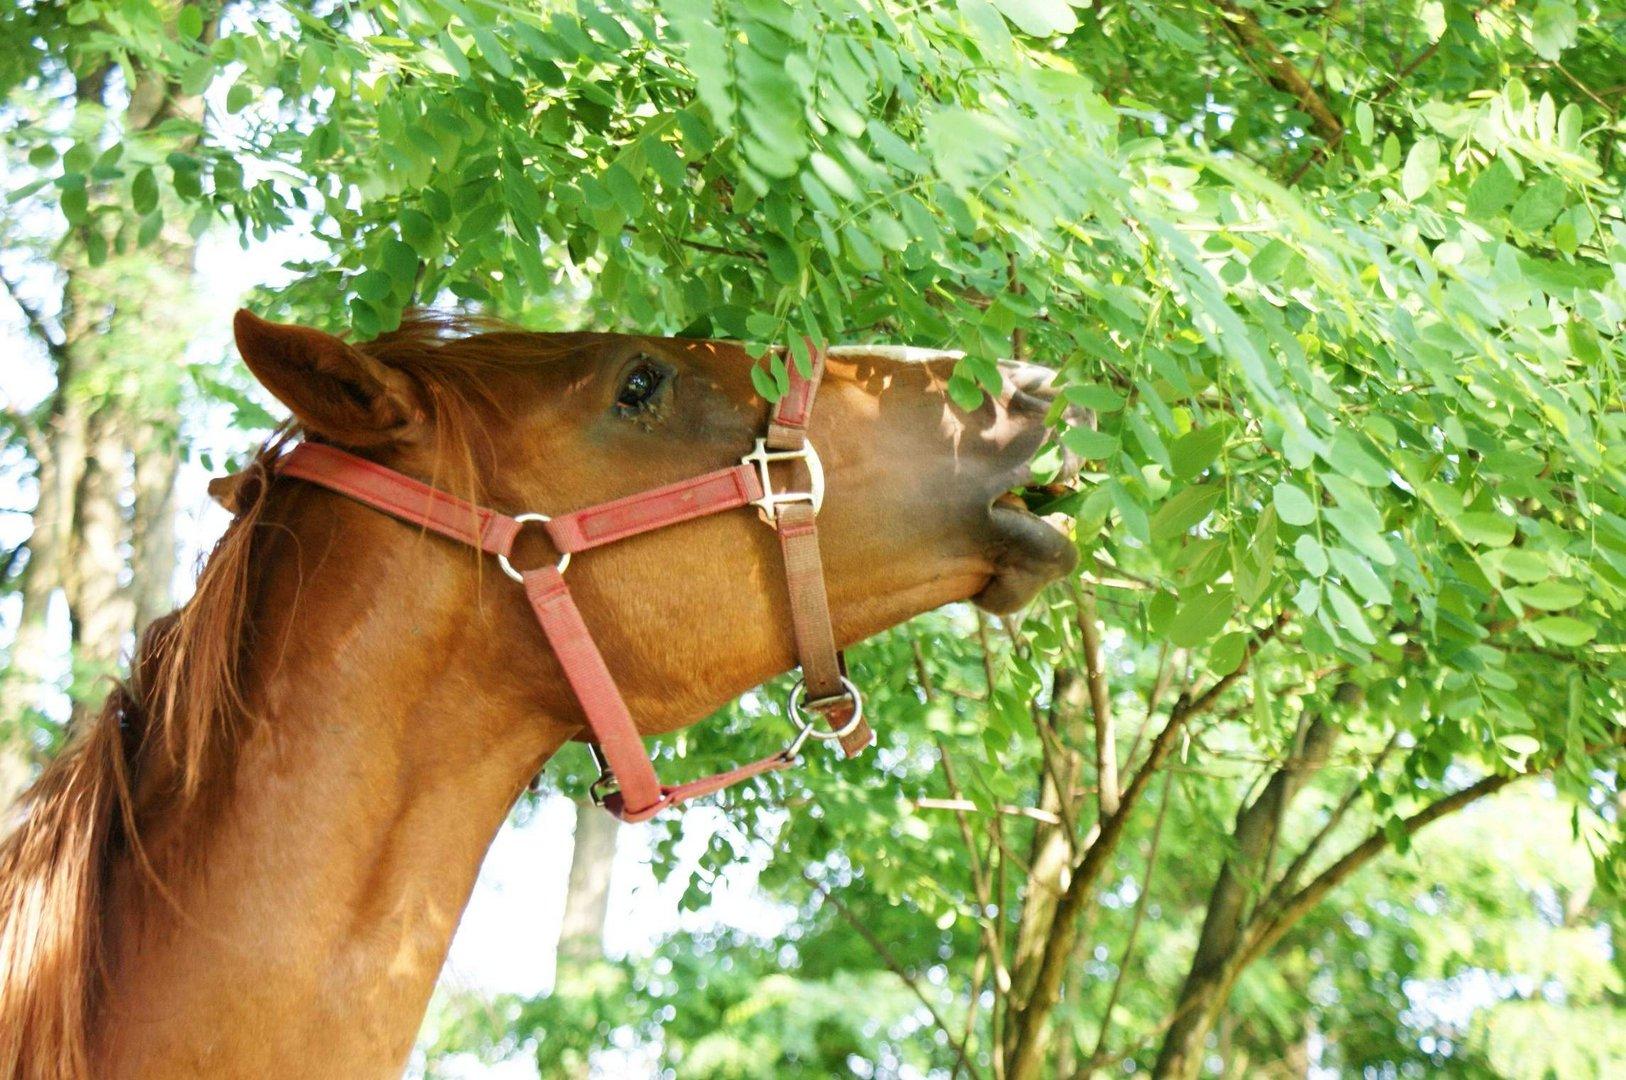 Pferde frißt grifte Robinie